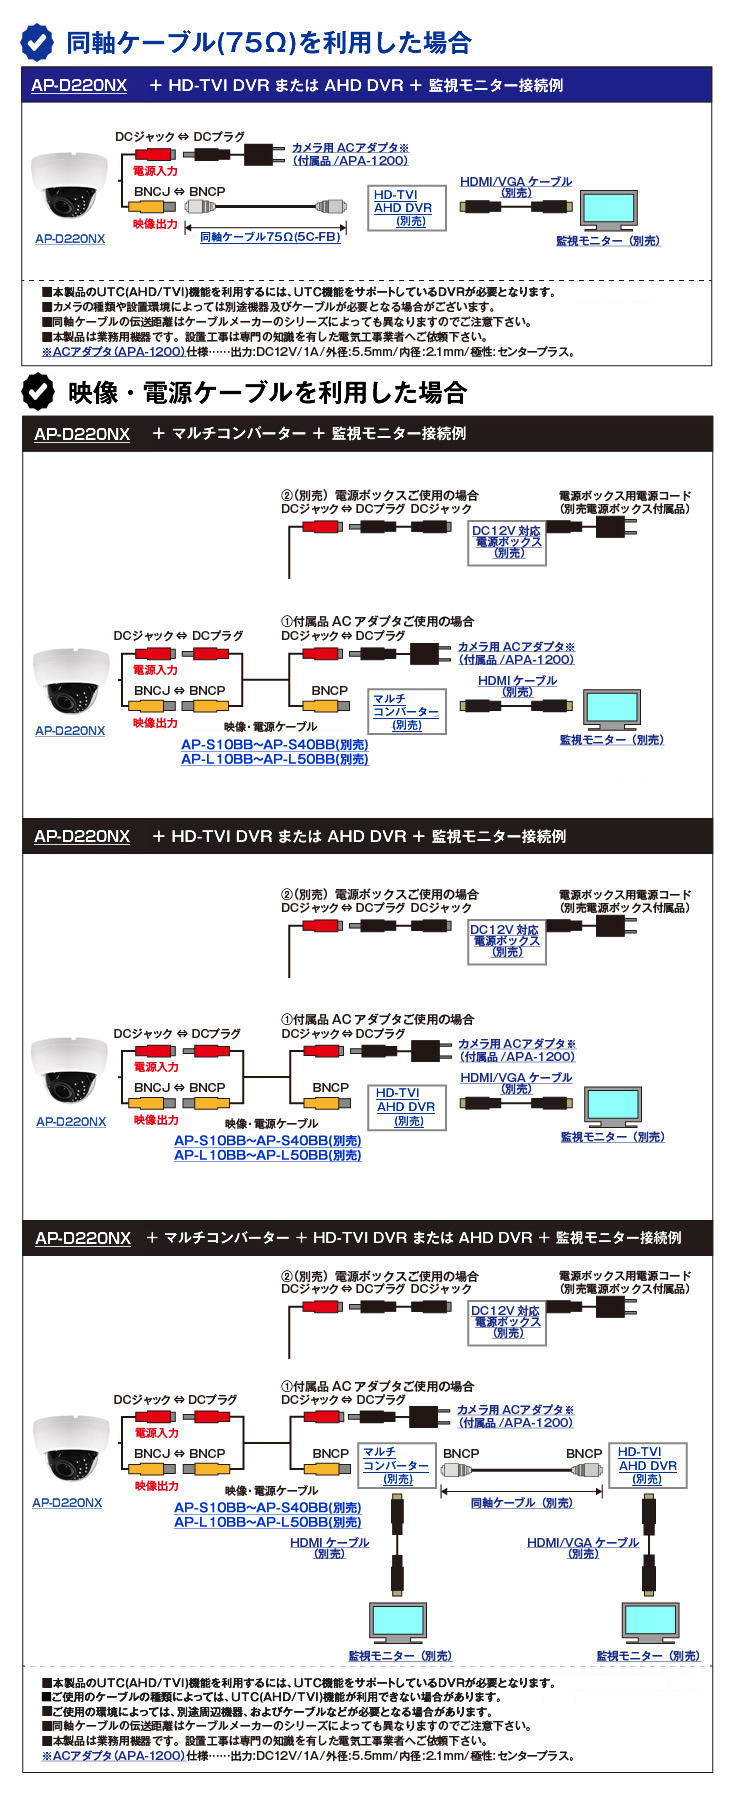 AHD 200万画素ドーム型防犯カメラ(AP-D220NX)